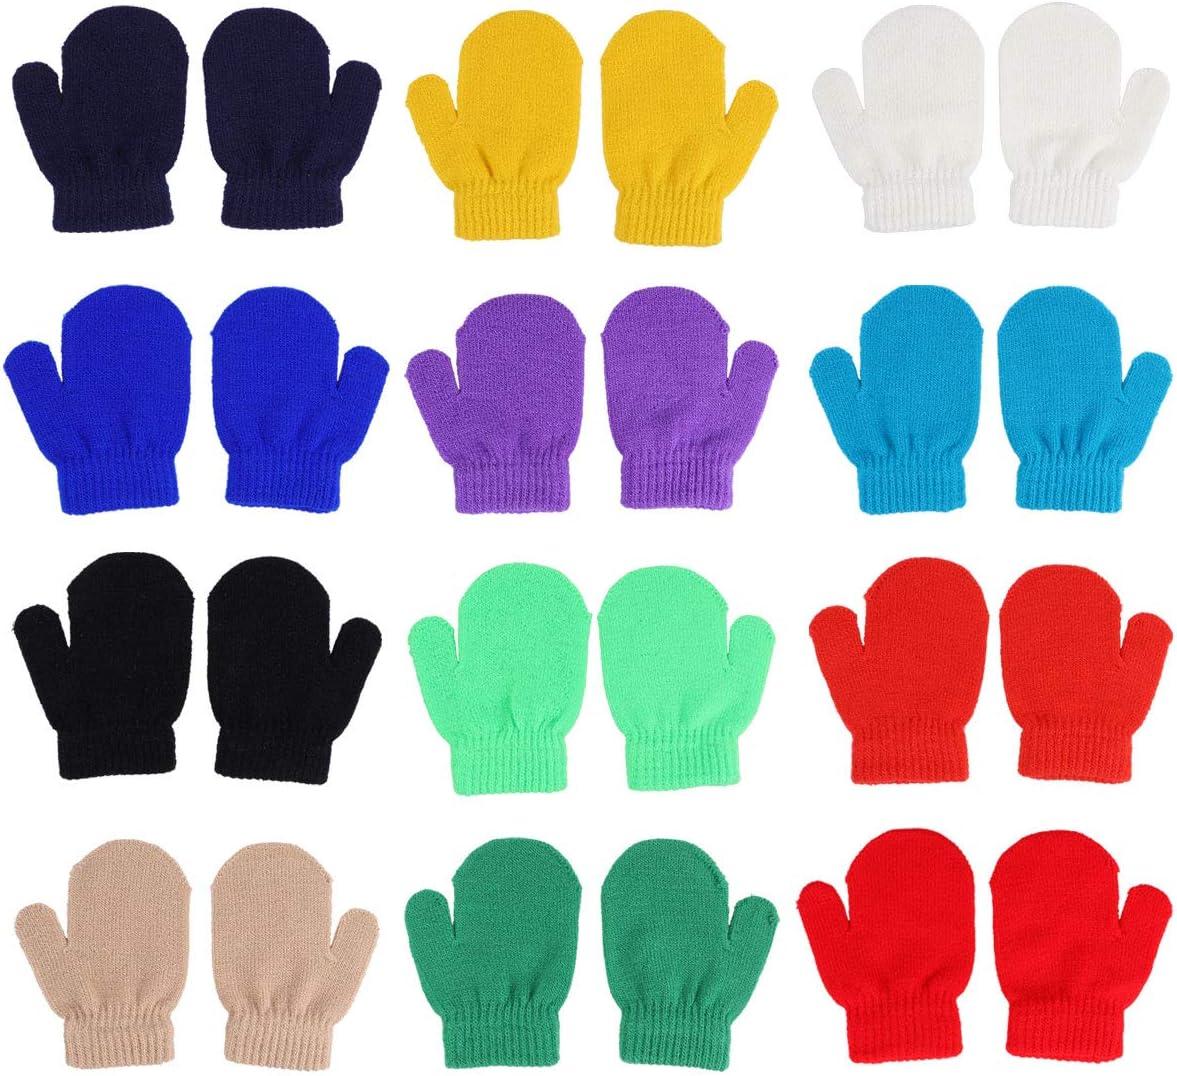 PRETYZOOM 12 Pairs of Acrylic Gloves Children' Winter Warm Monochrome Knitted Gloves